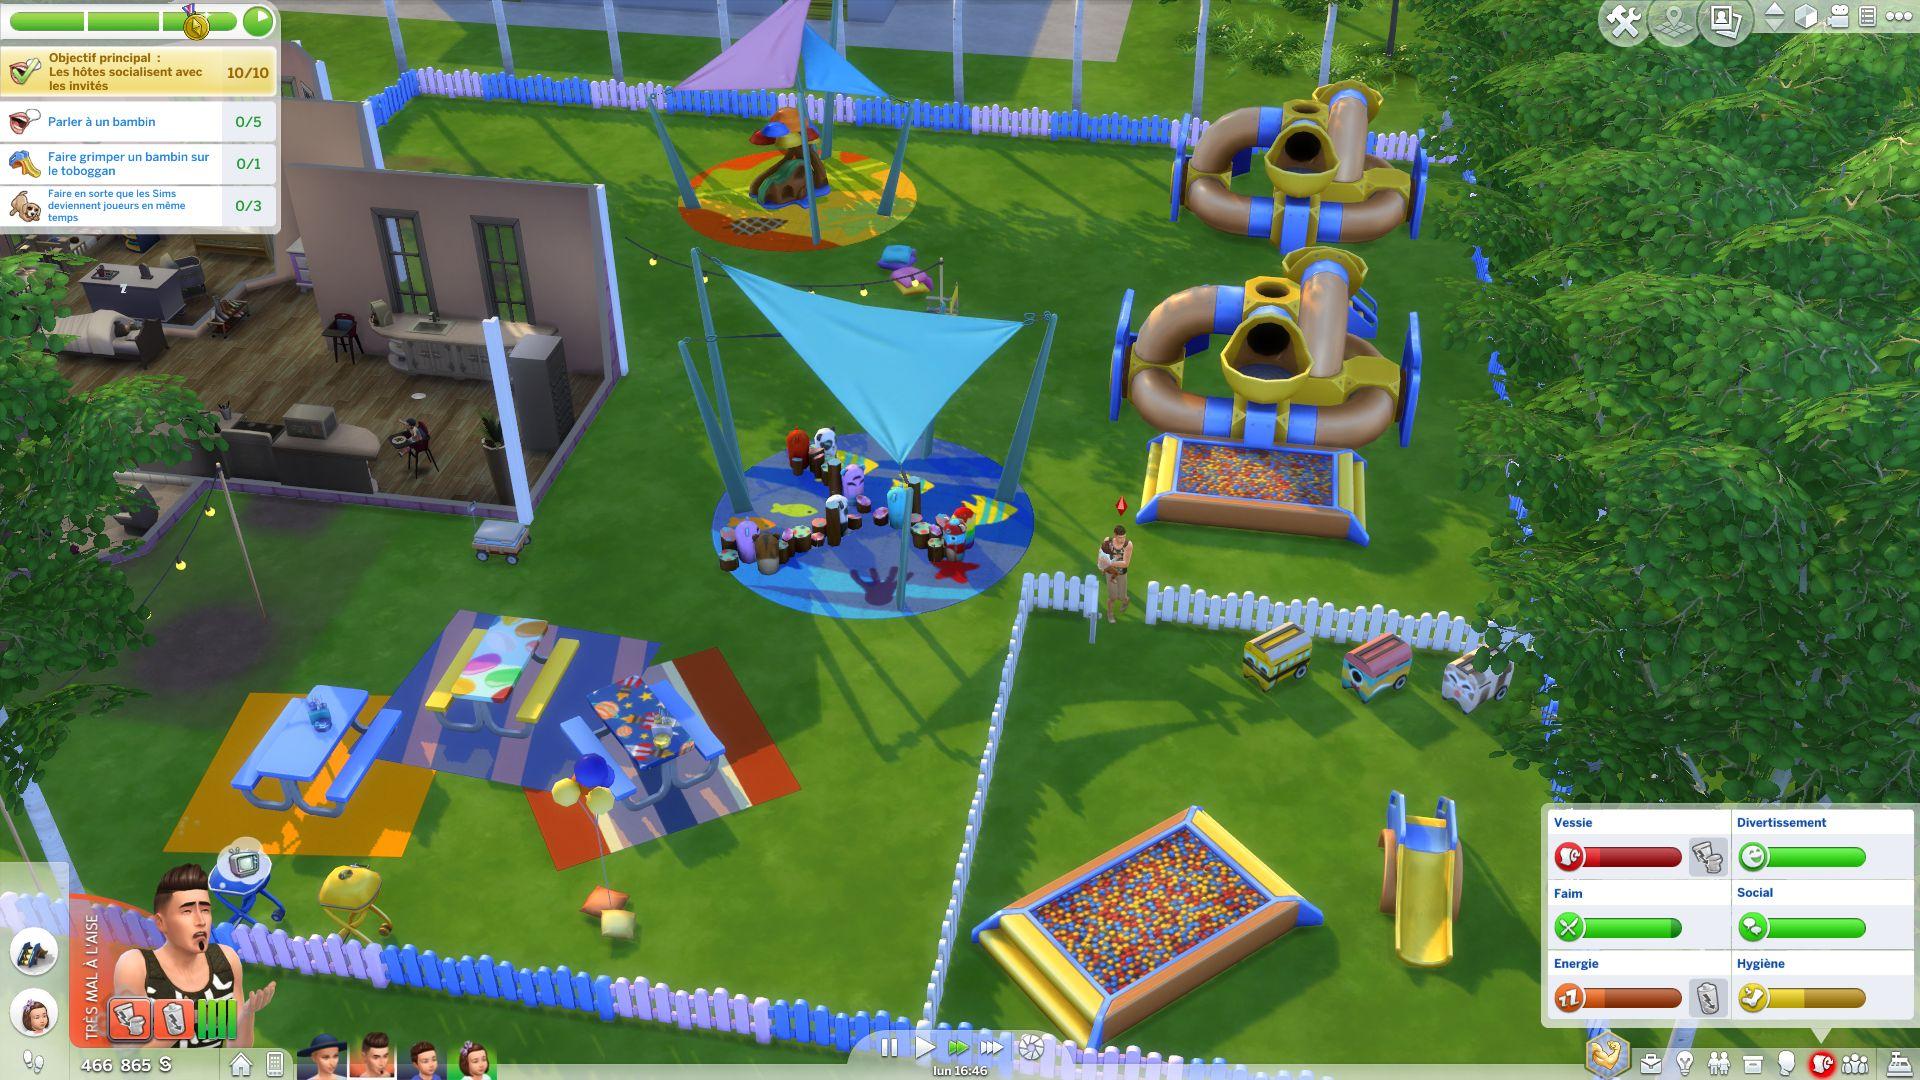 rencontres interactives jeux Sims mon Seigneur datant gay